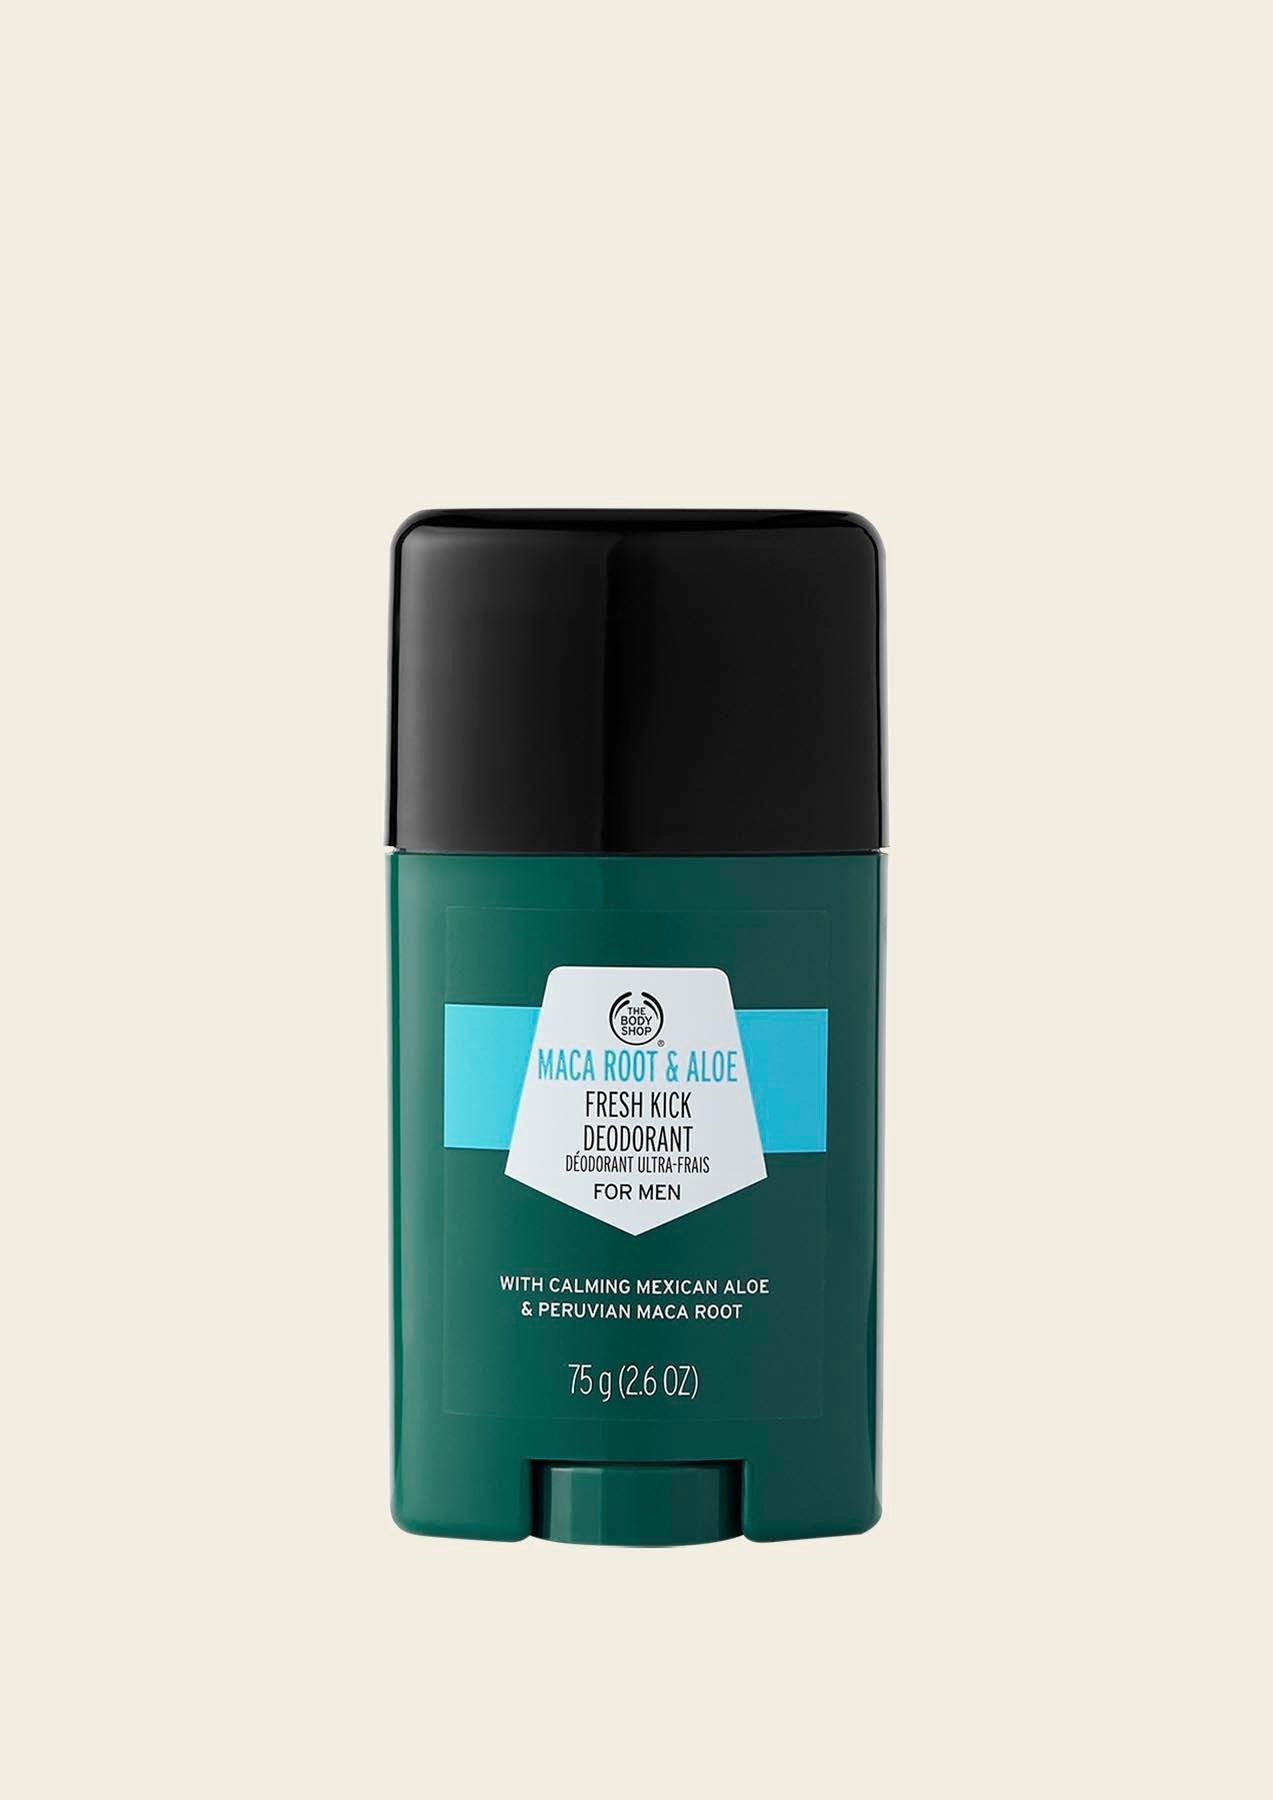 Deodorant Maca Root & Aloe Fresh Kick